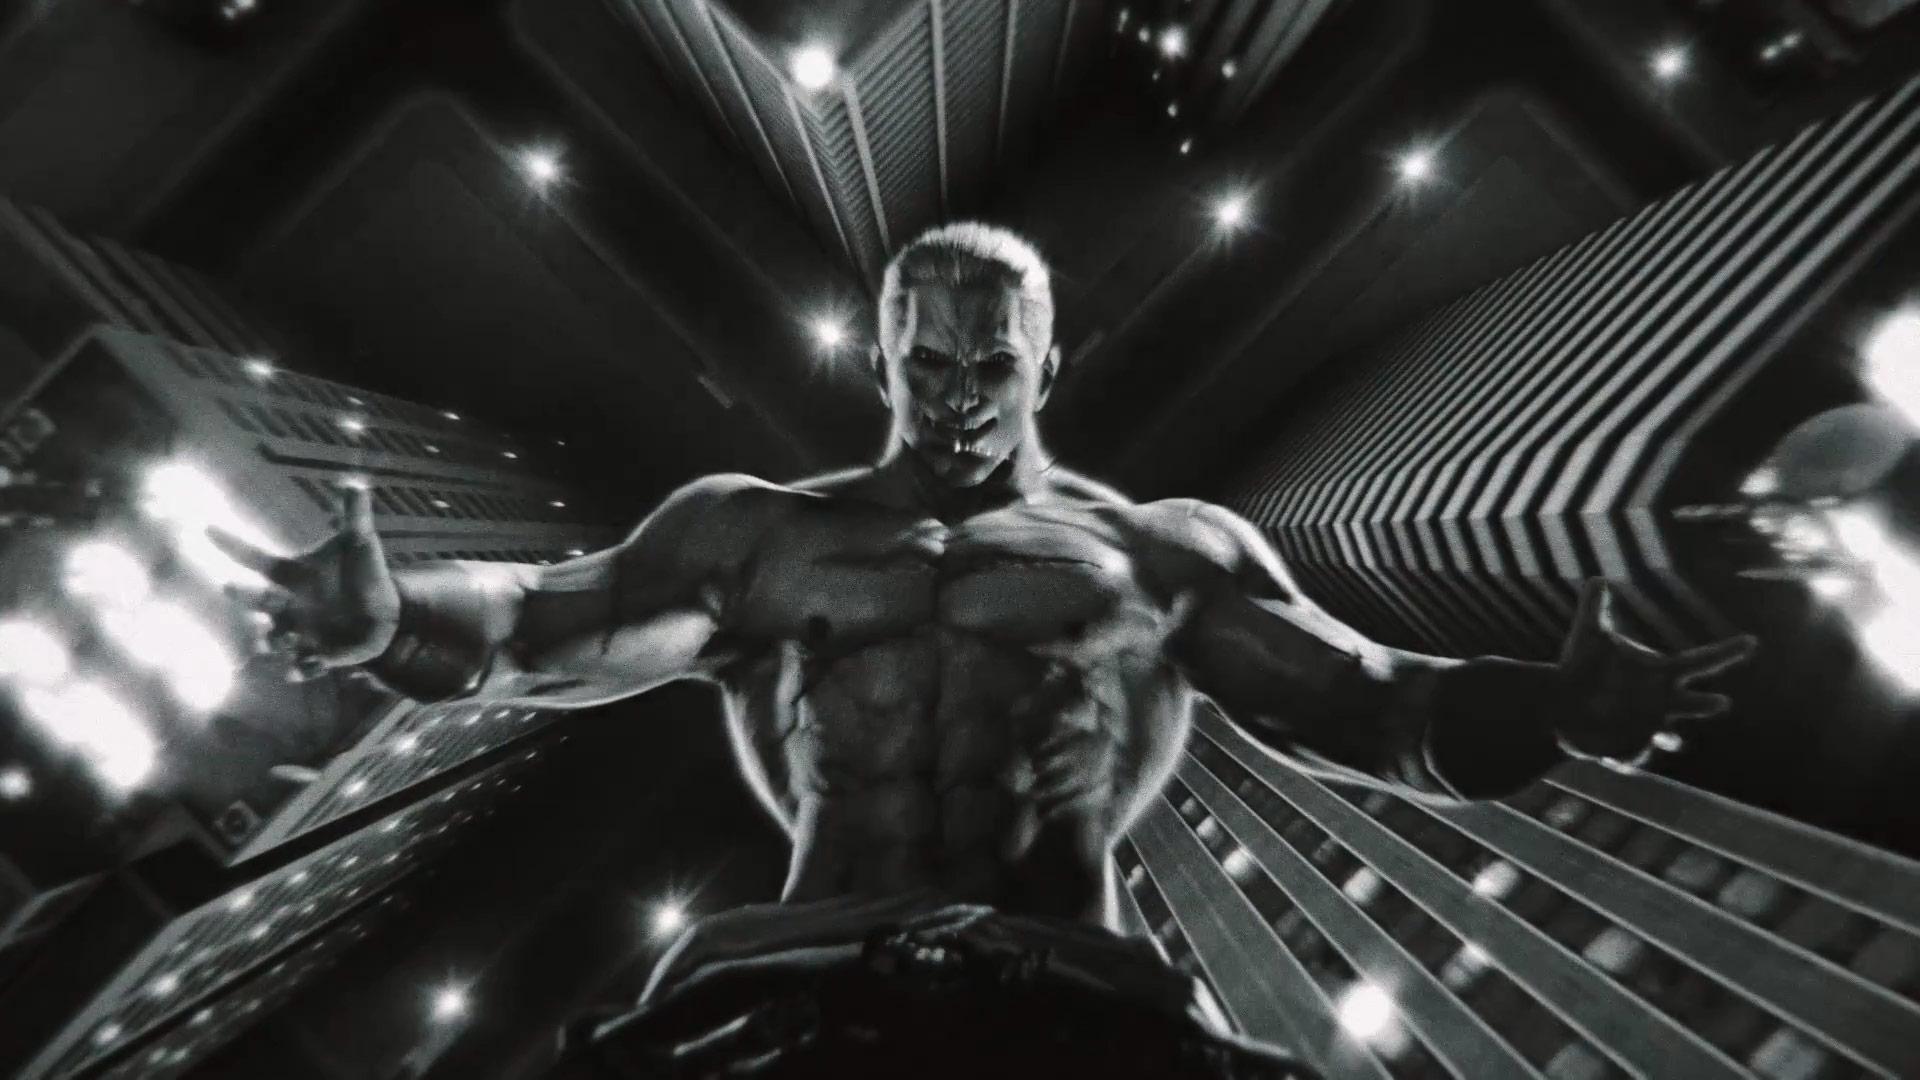 Geese Howard Tekken 7 screen shots 5 out of 9 image gallery